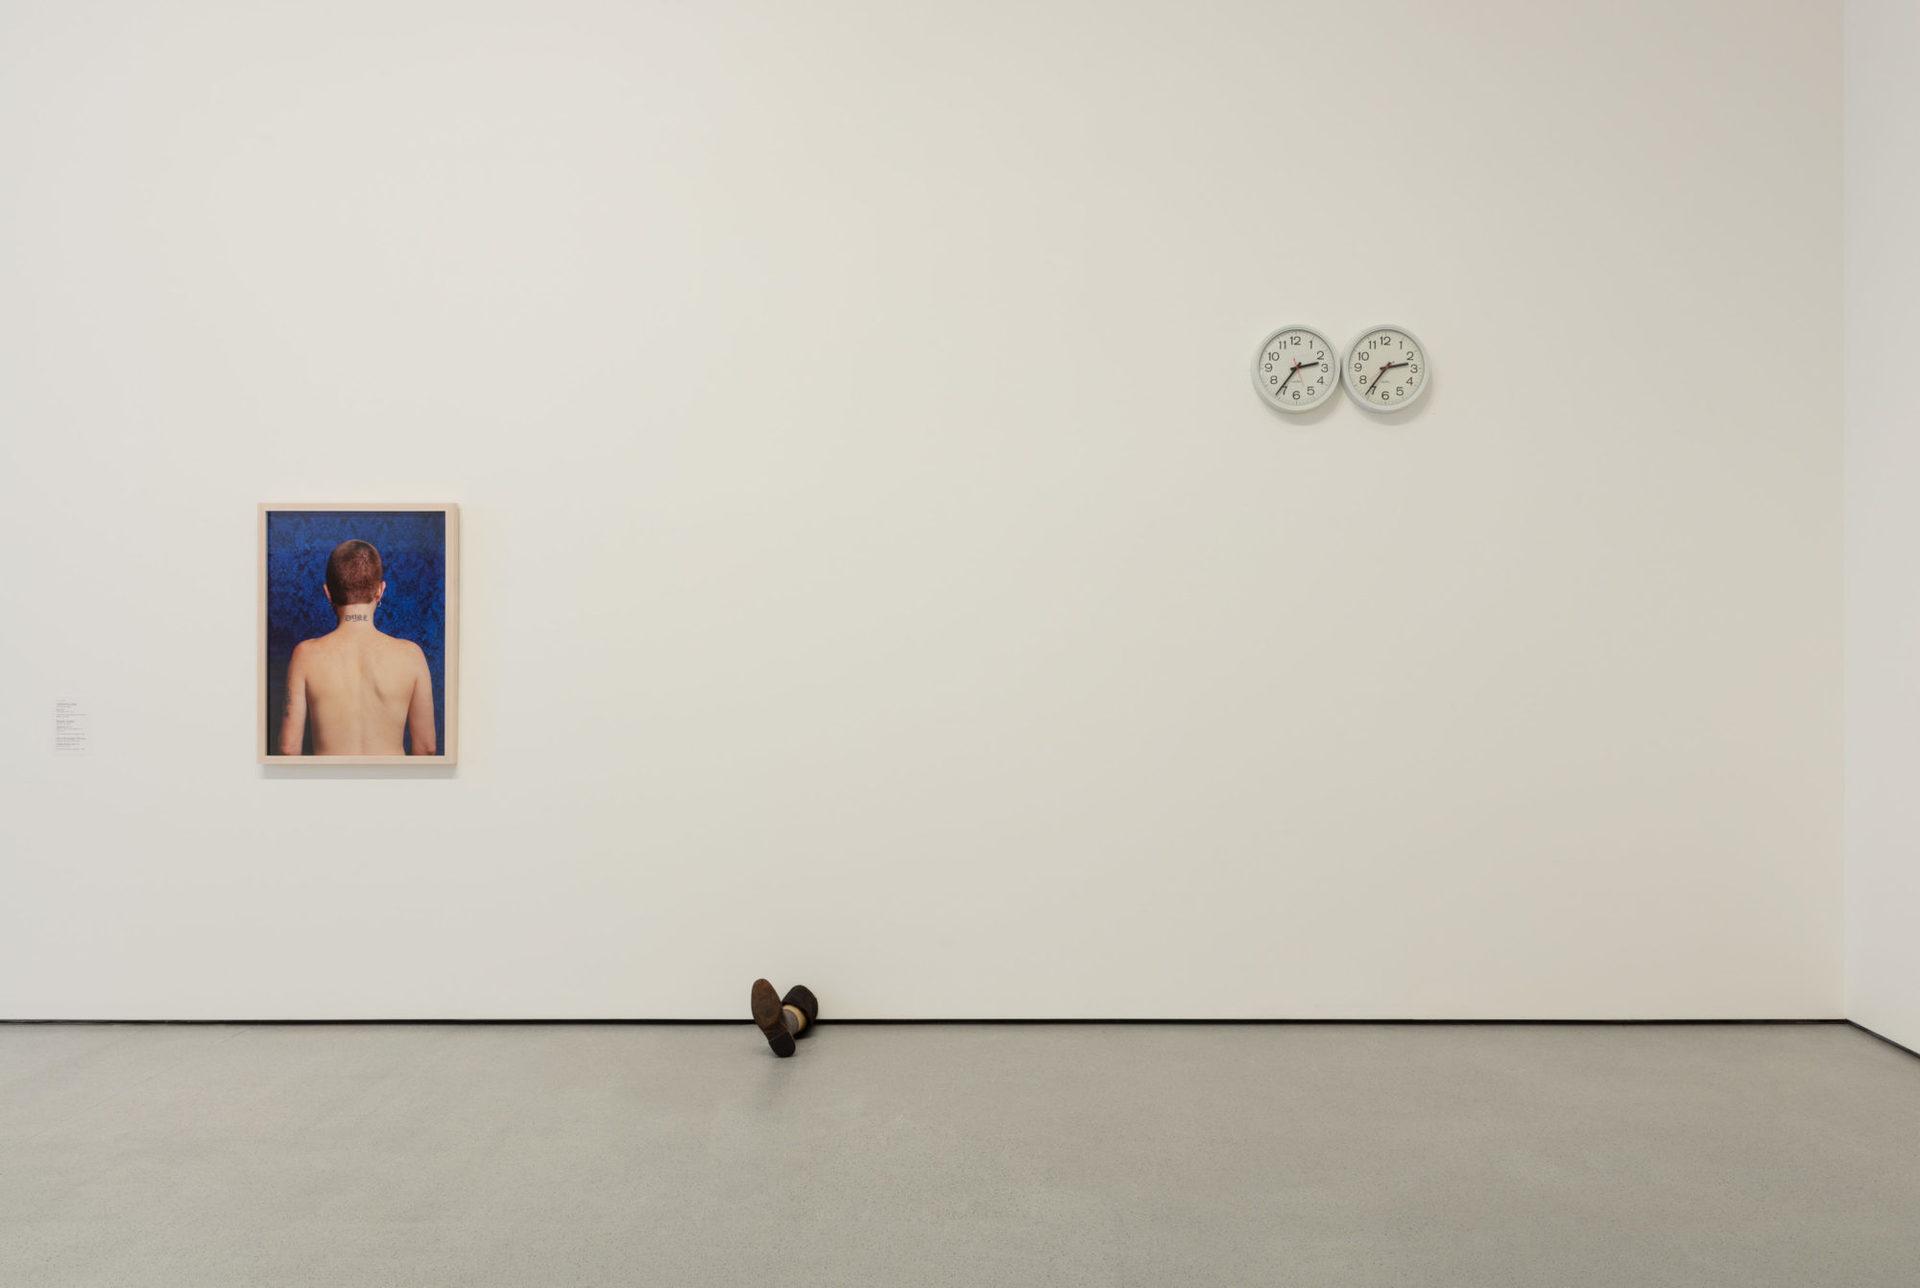 MoMA_gallery208_JohnWronn-2000x1342.jpg